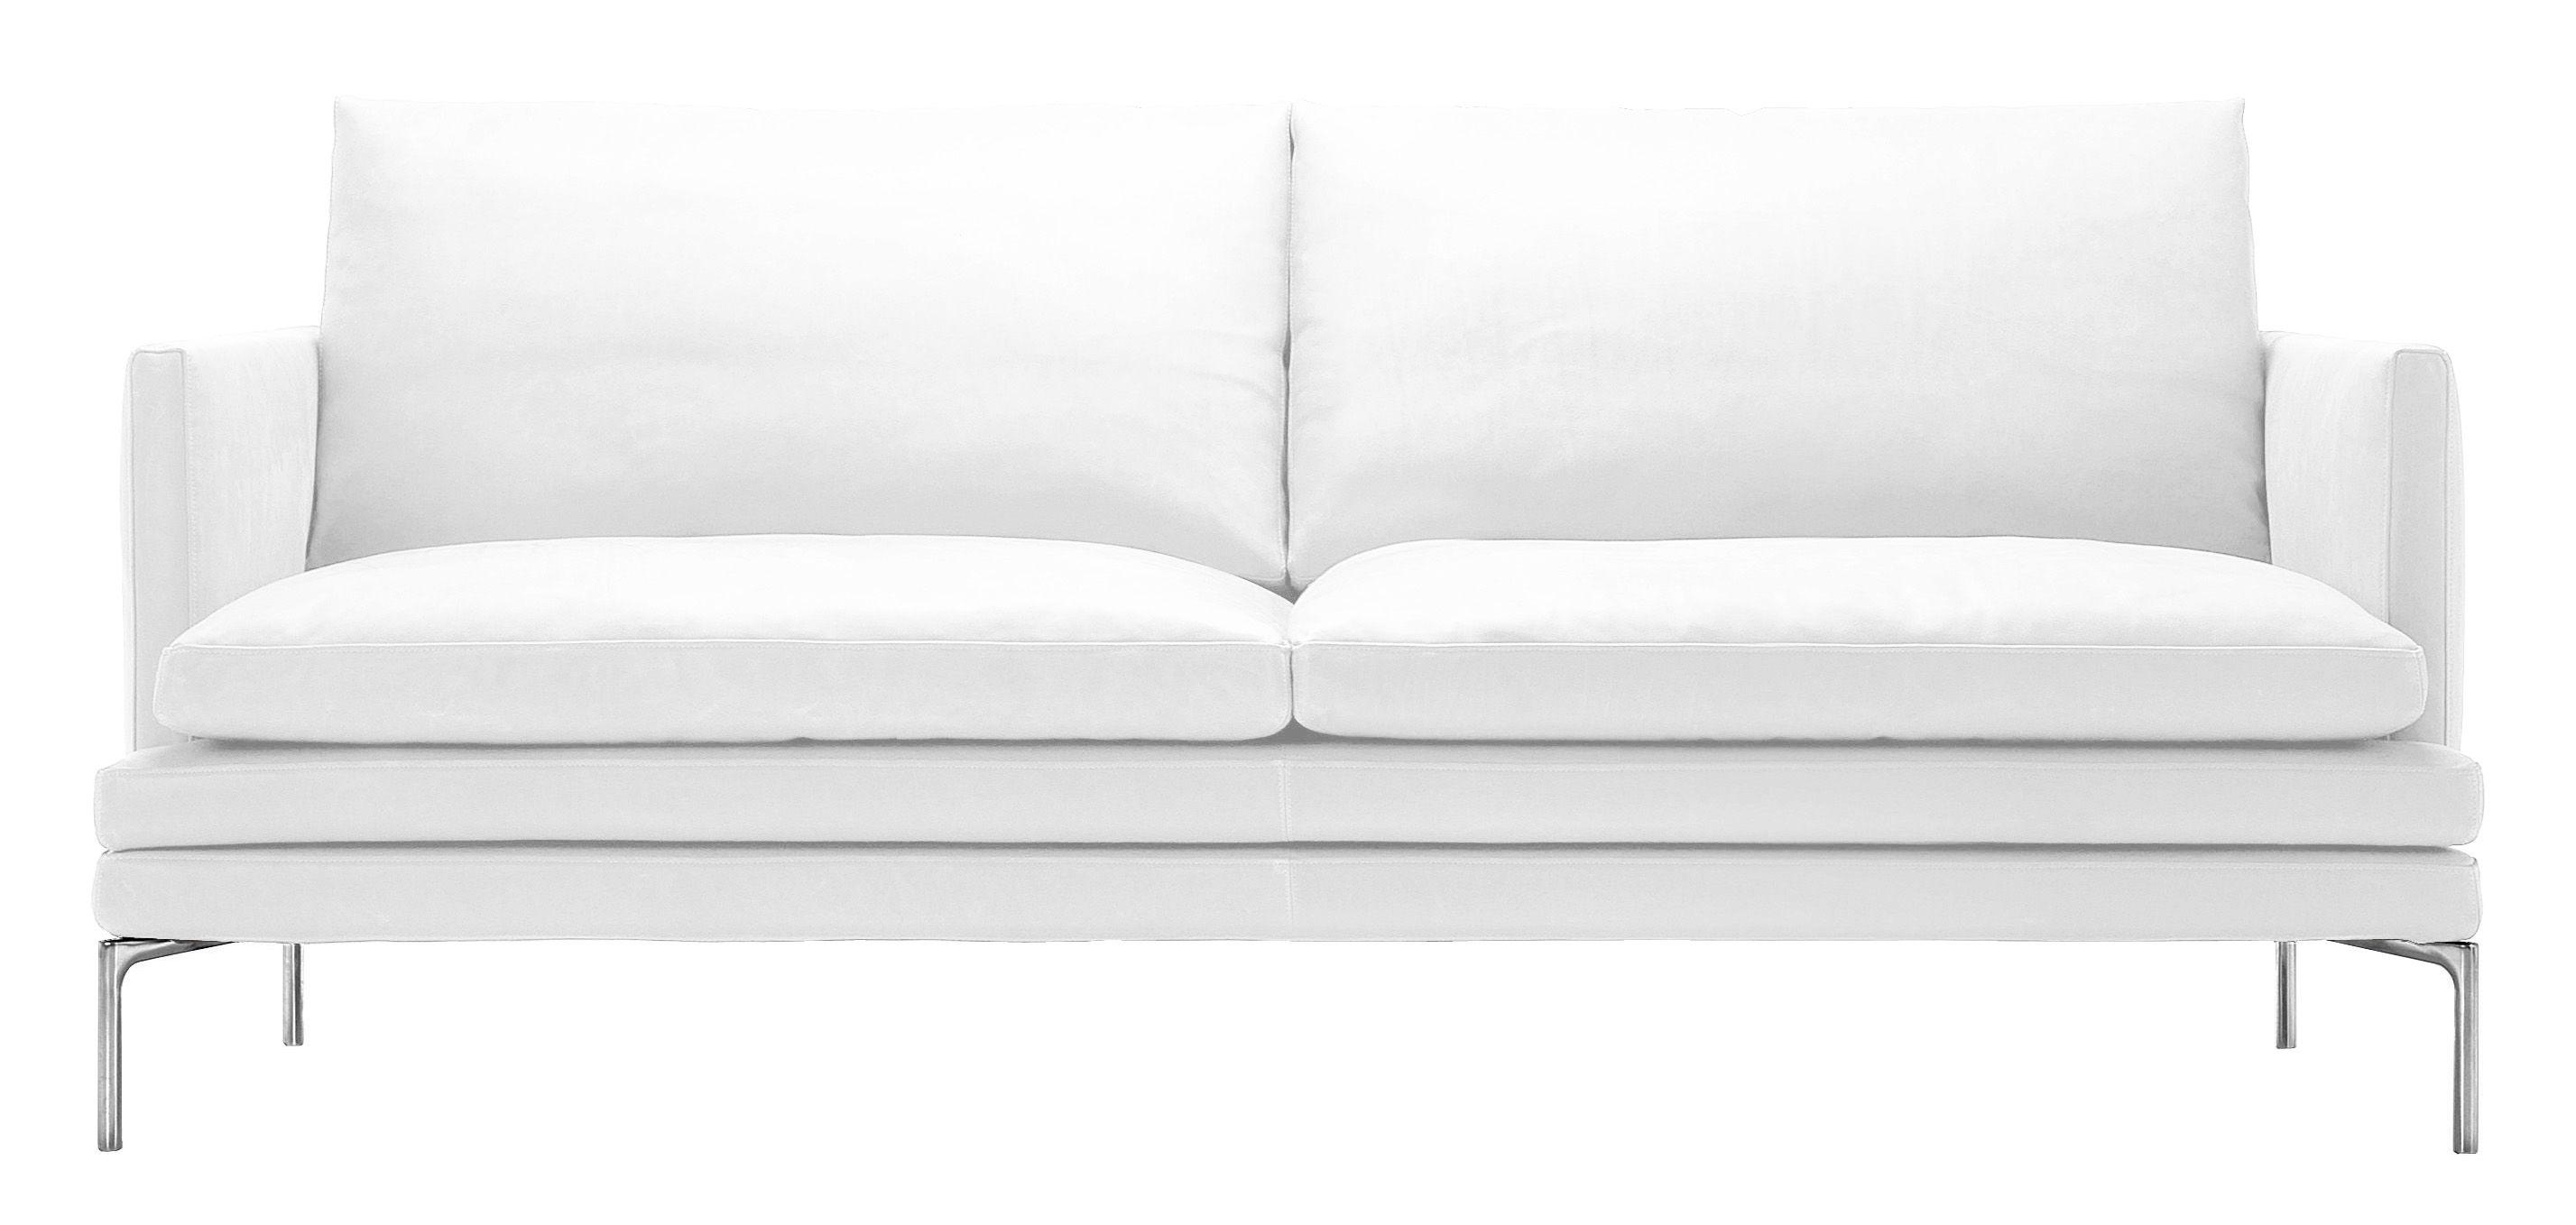 Mobilier - Canapés - Canapé droit William / Tissu - 2 places - L 180 cm - Zanotta - Blanc - Aluminium poli, Tissu